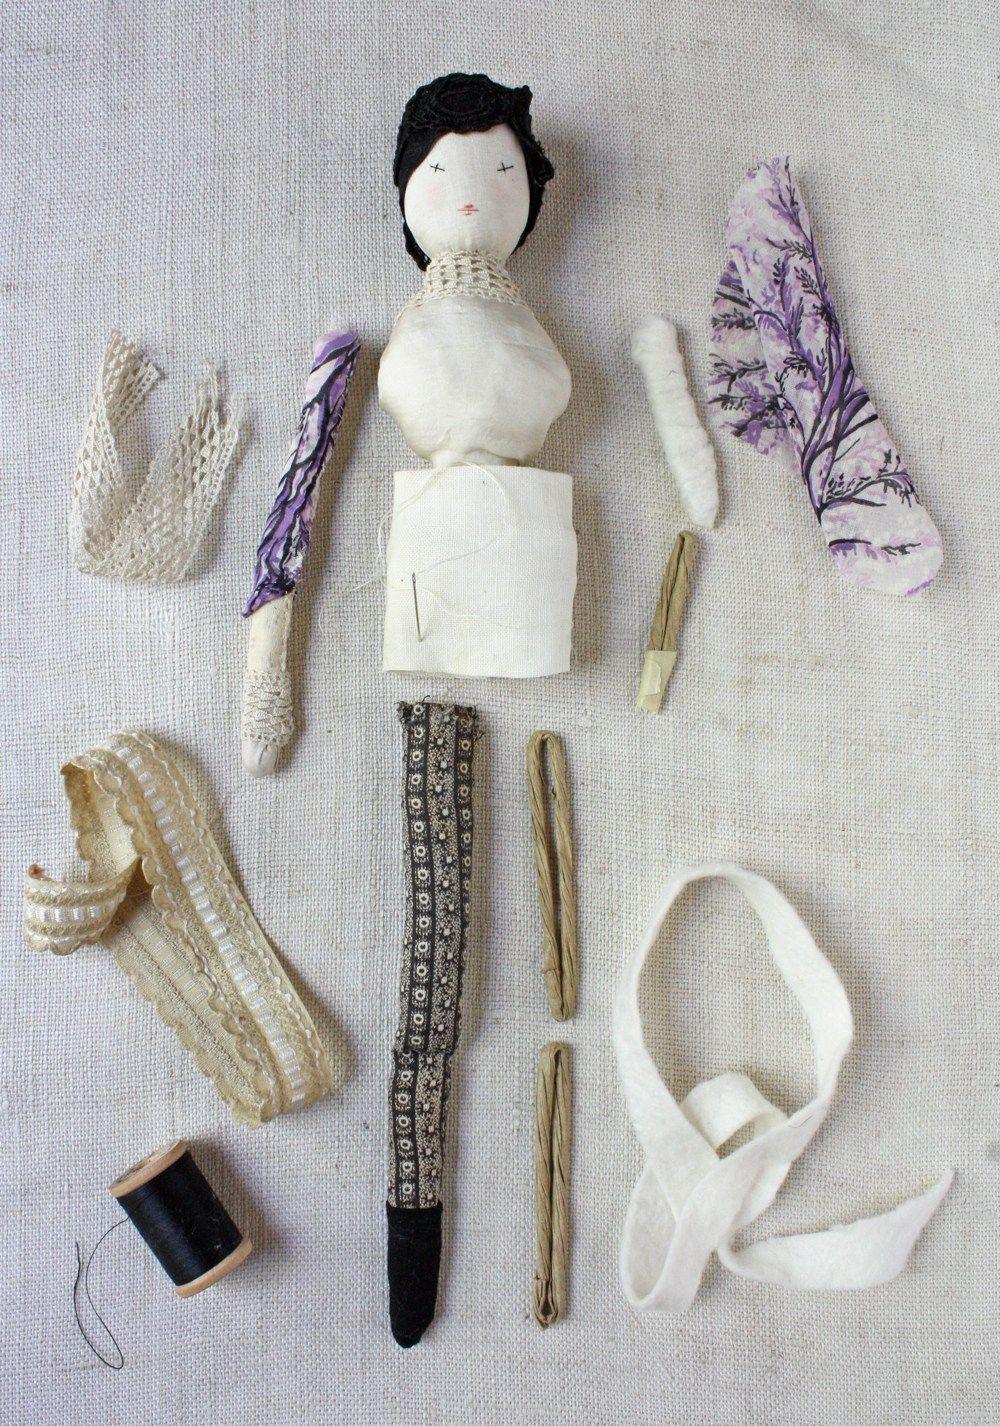 improvisational doll making - part 2 #dollmaking